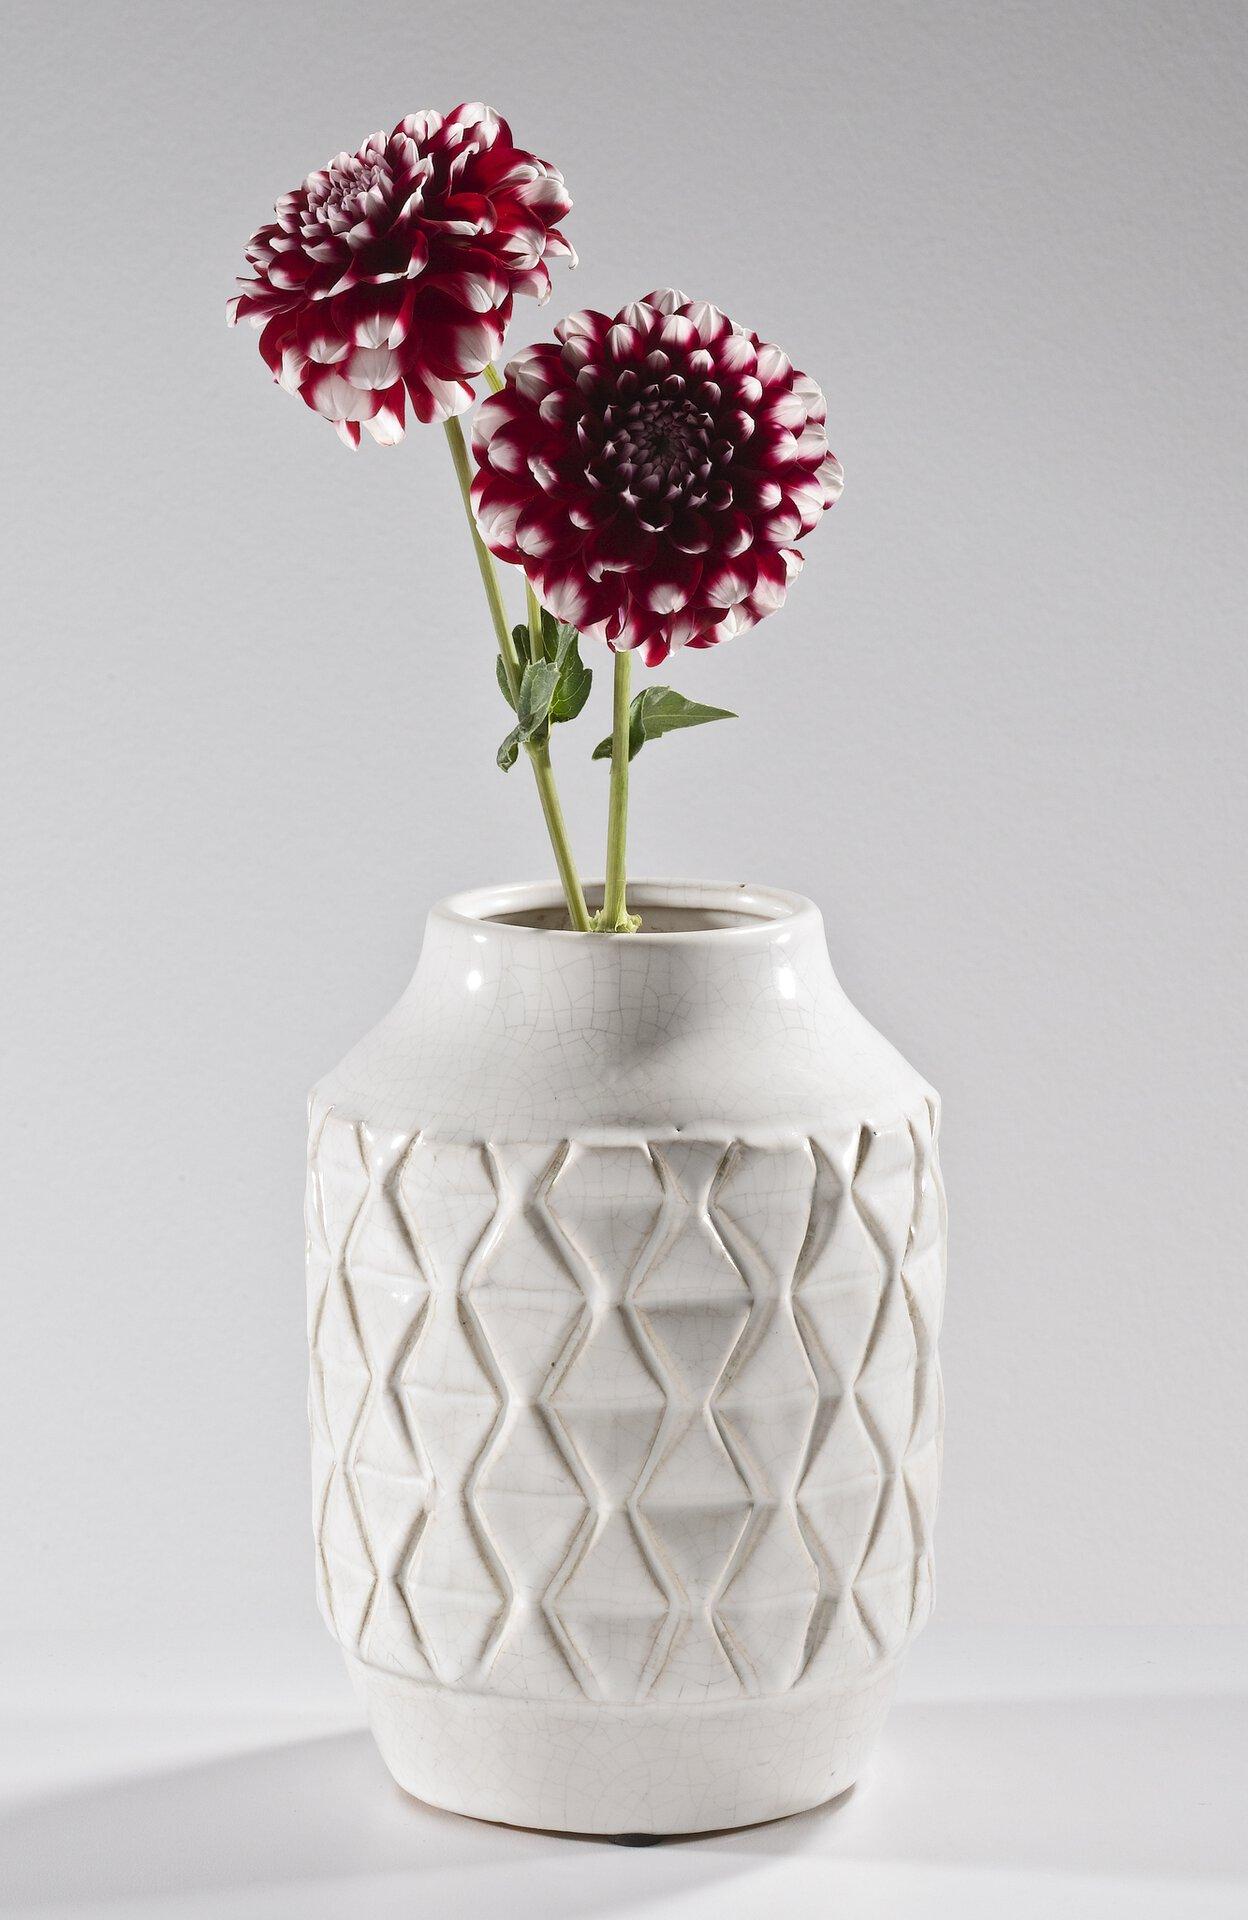 Vase 185110 Casa Nova Keramik weiß 21 x